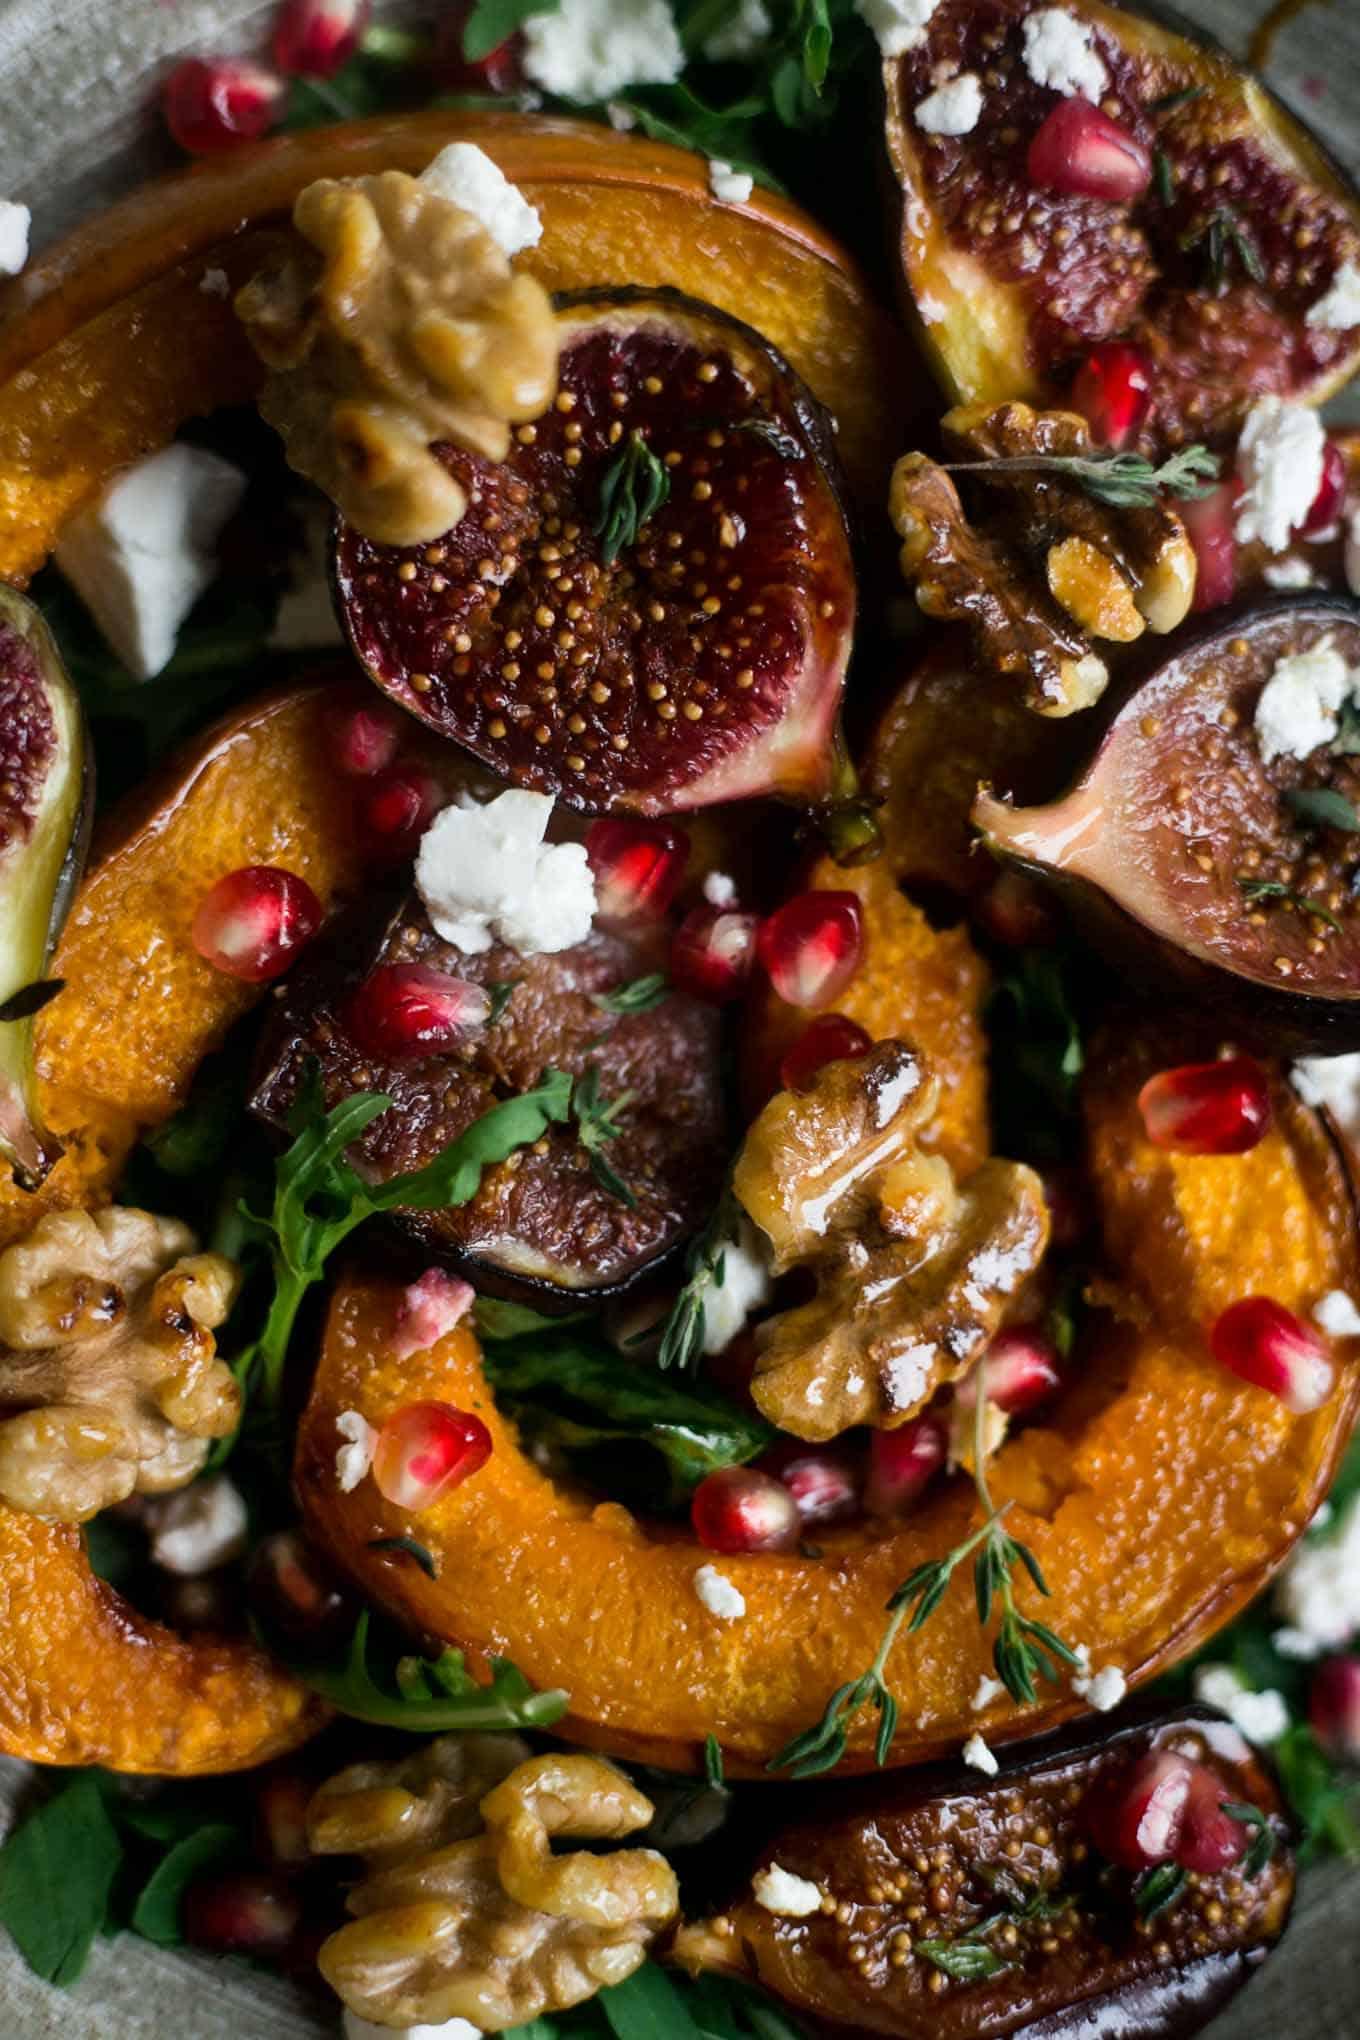 Roasted Pumpkin Salad with Walnuts | Anna Banana